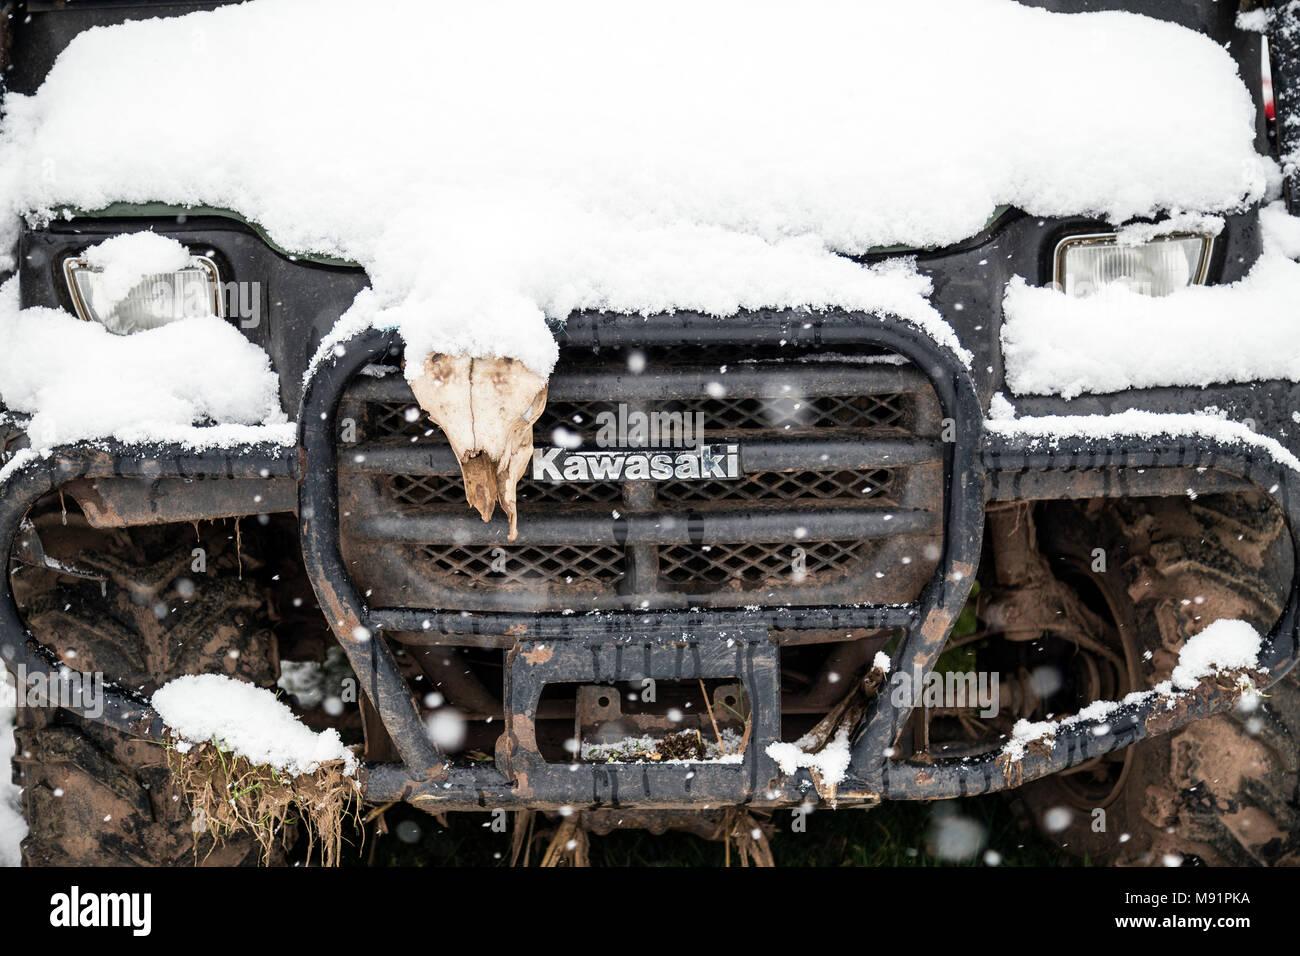 snowstorm near Dunsford Devon, snow blast, snow squall white-out,snowflakes, flakes, snowdrift, snowfield, snowpack snowfall, snowstorm, blizzard - Stock Image